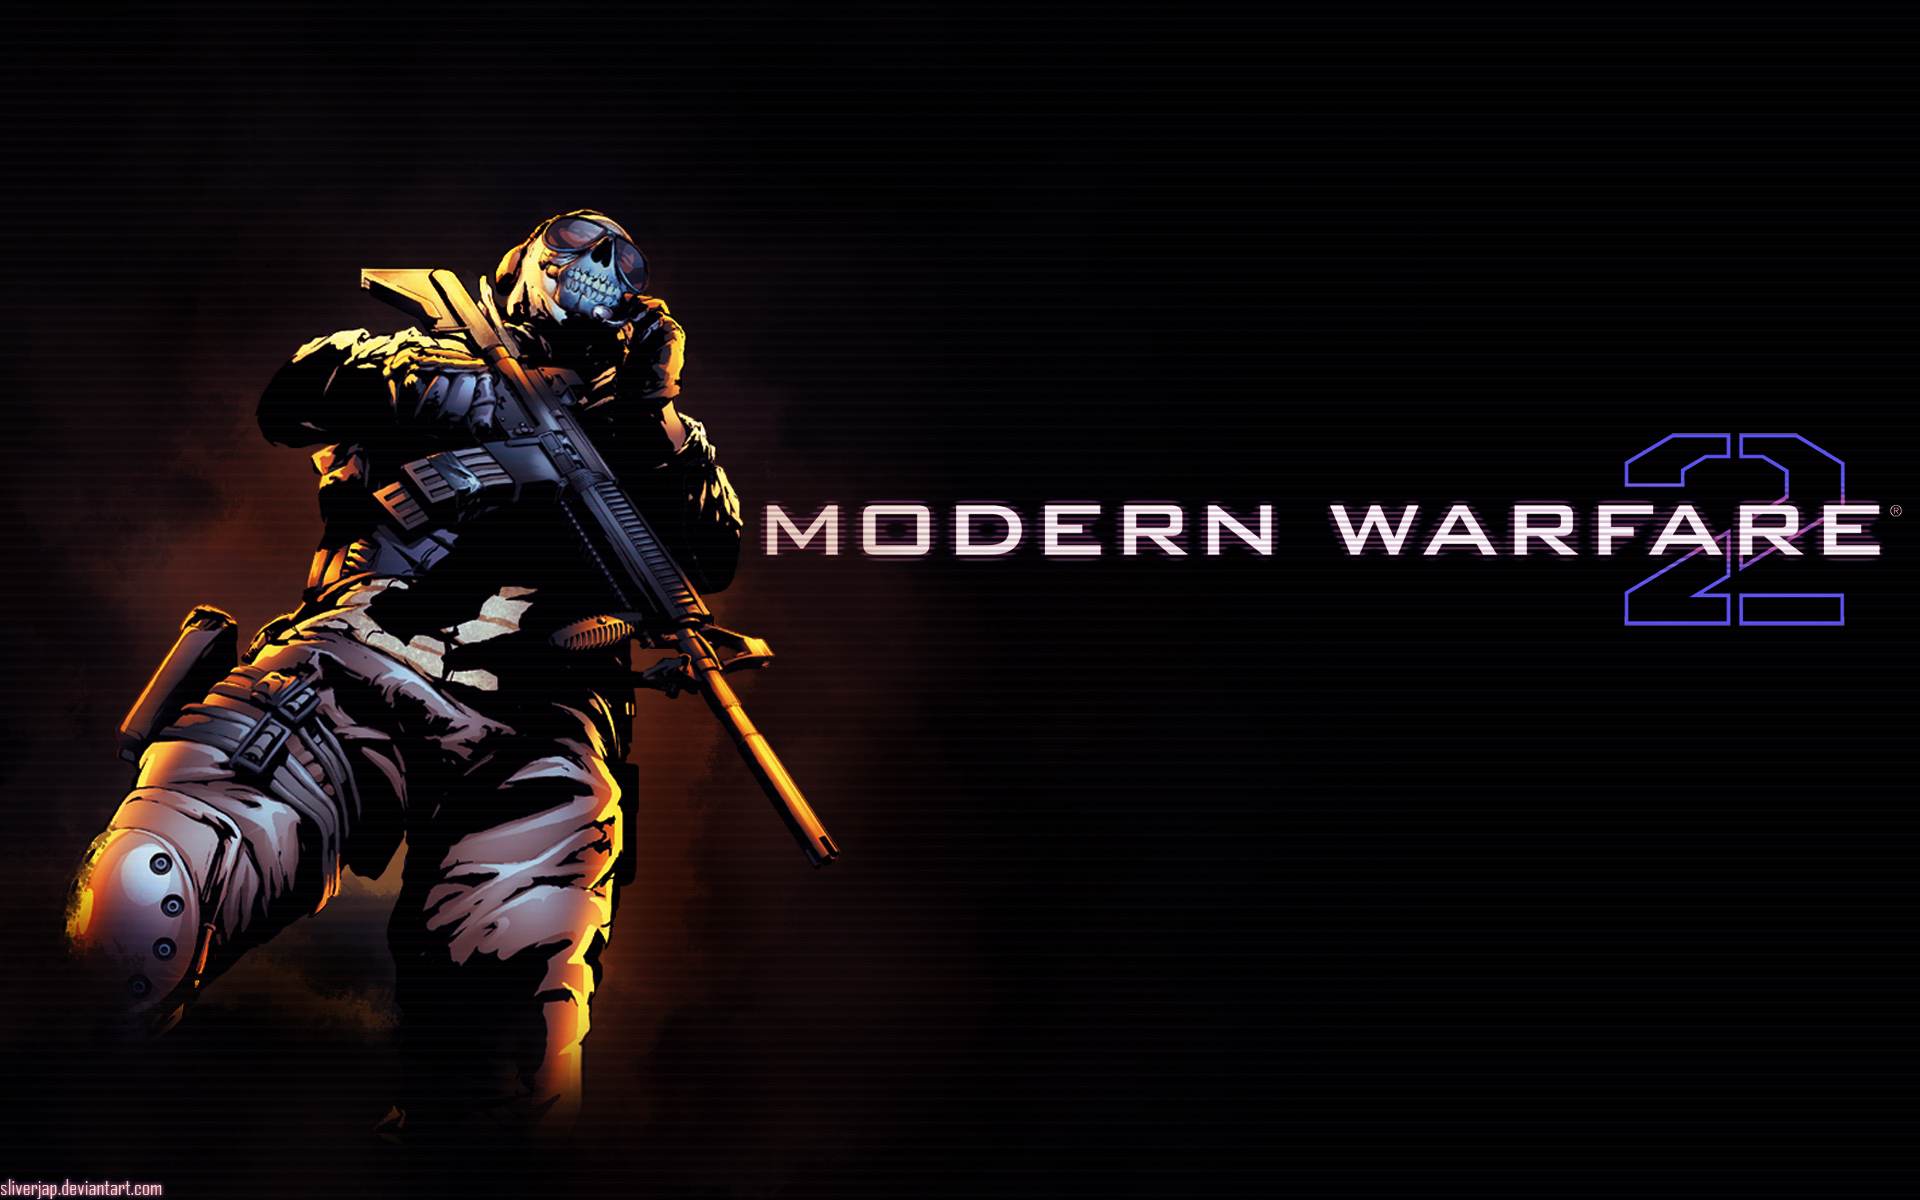 Modern Warfare 2 Ghost Art Wallpapers Modern Warfare 2 Ghost Art 1920x1200